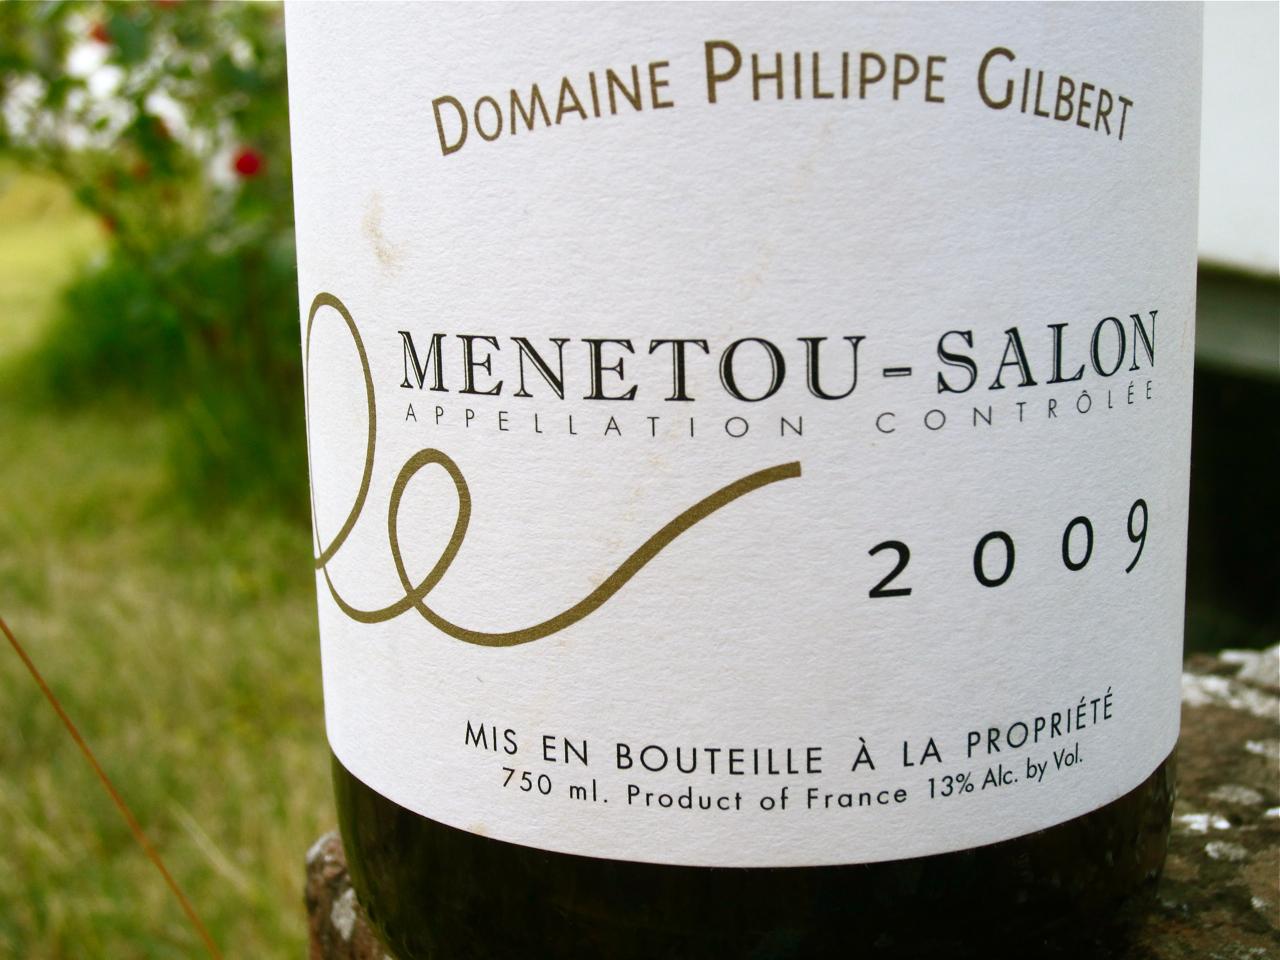 Finare vinare 2009 philippe gilbert menetou salon rouge for Menetou salon rouge